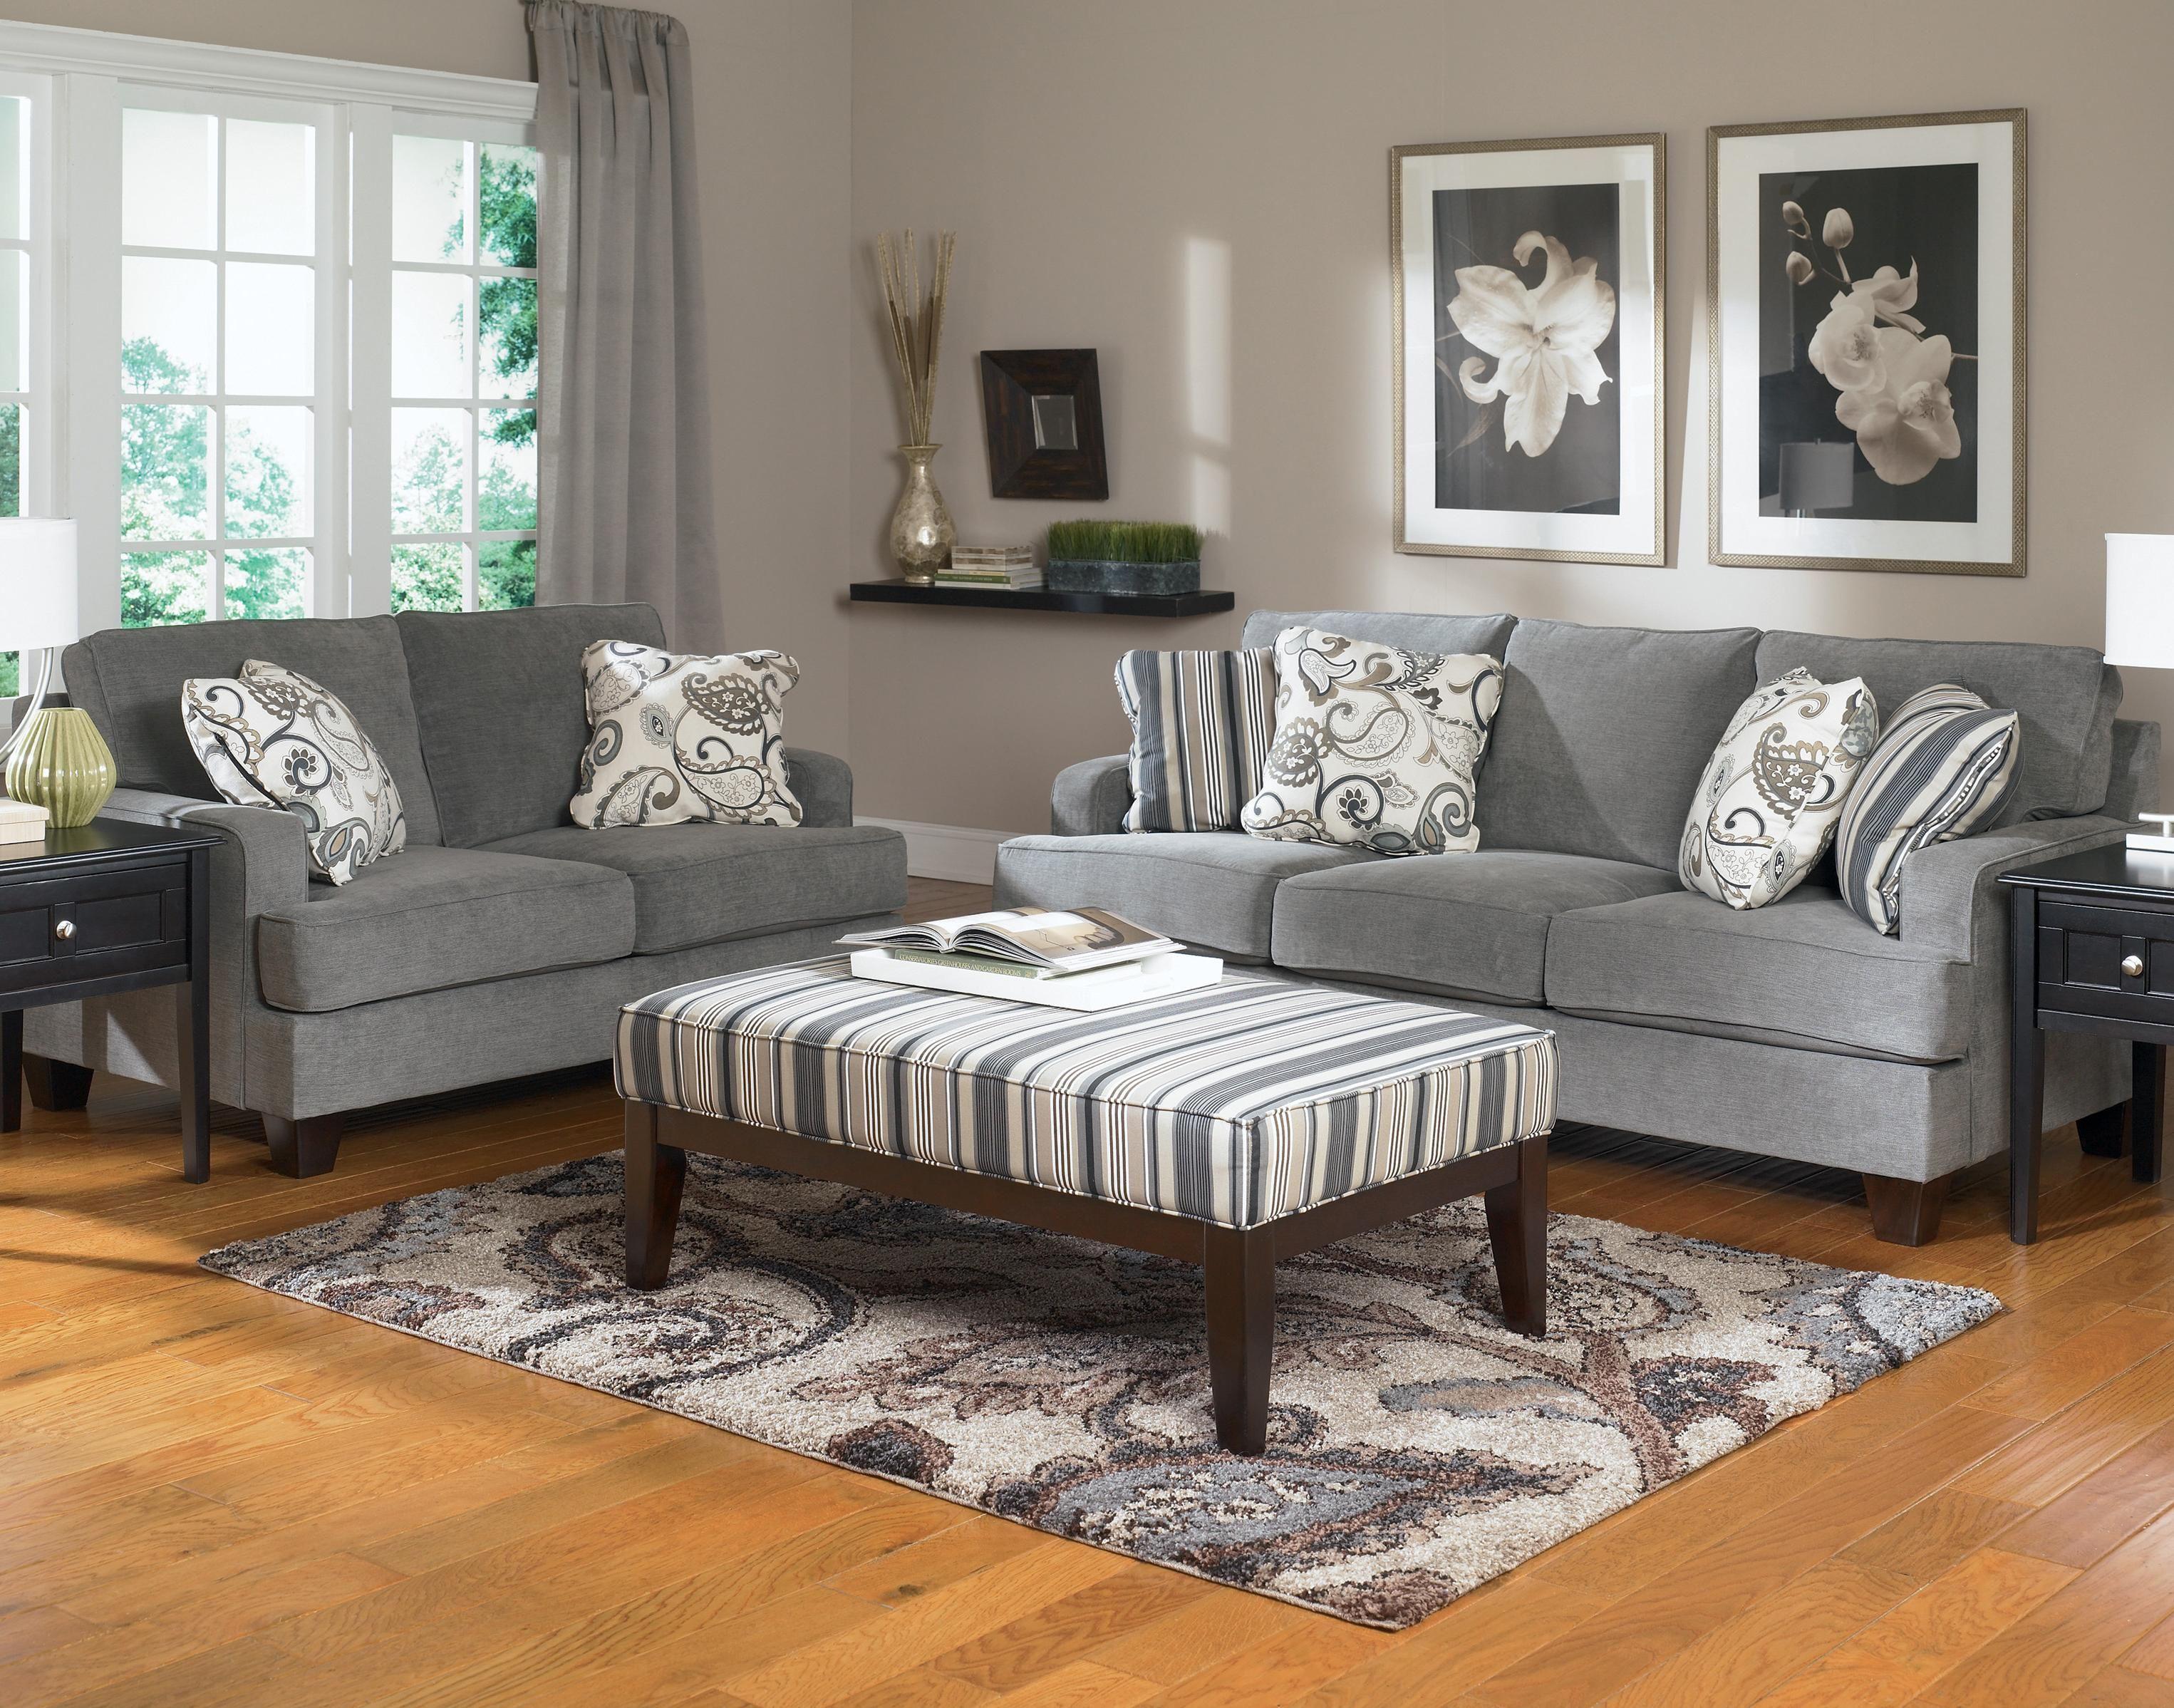 Nairobi Luxe Sofa Sets Wel e to Nairobi Luxe Furniture Designs